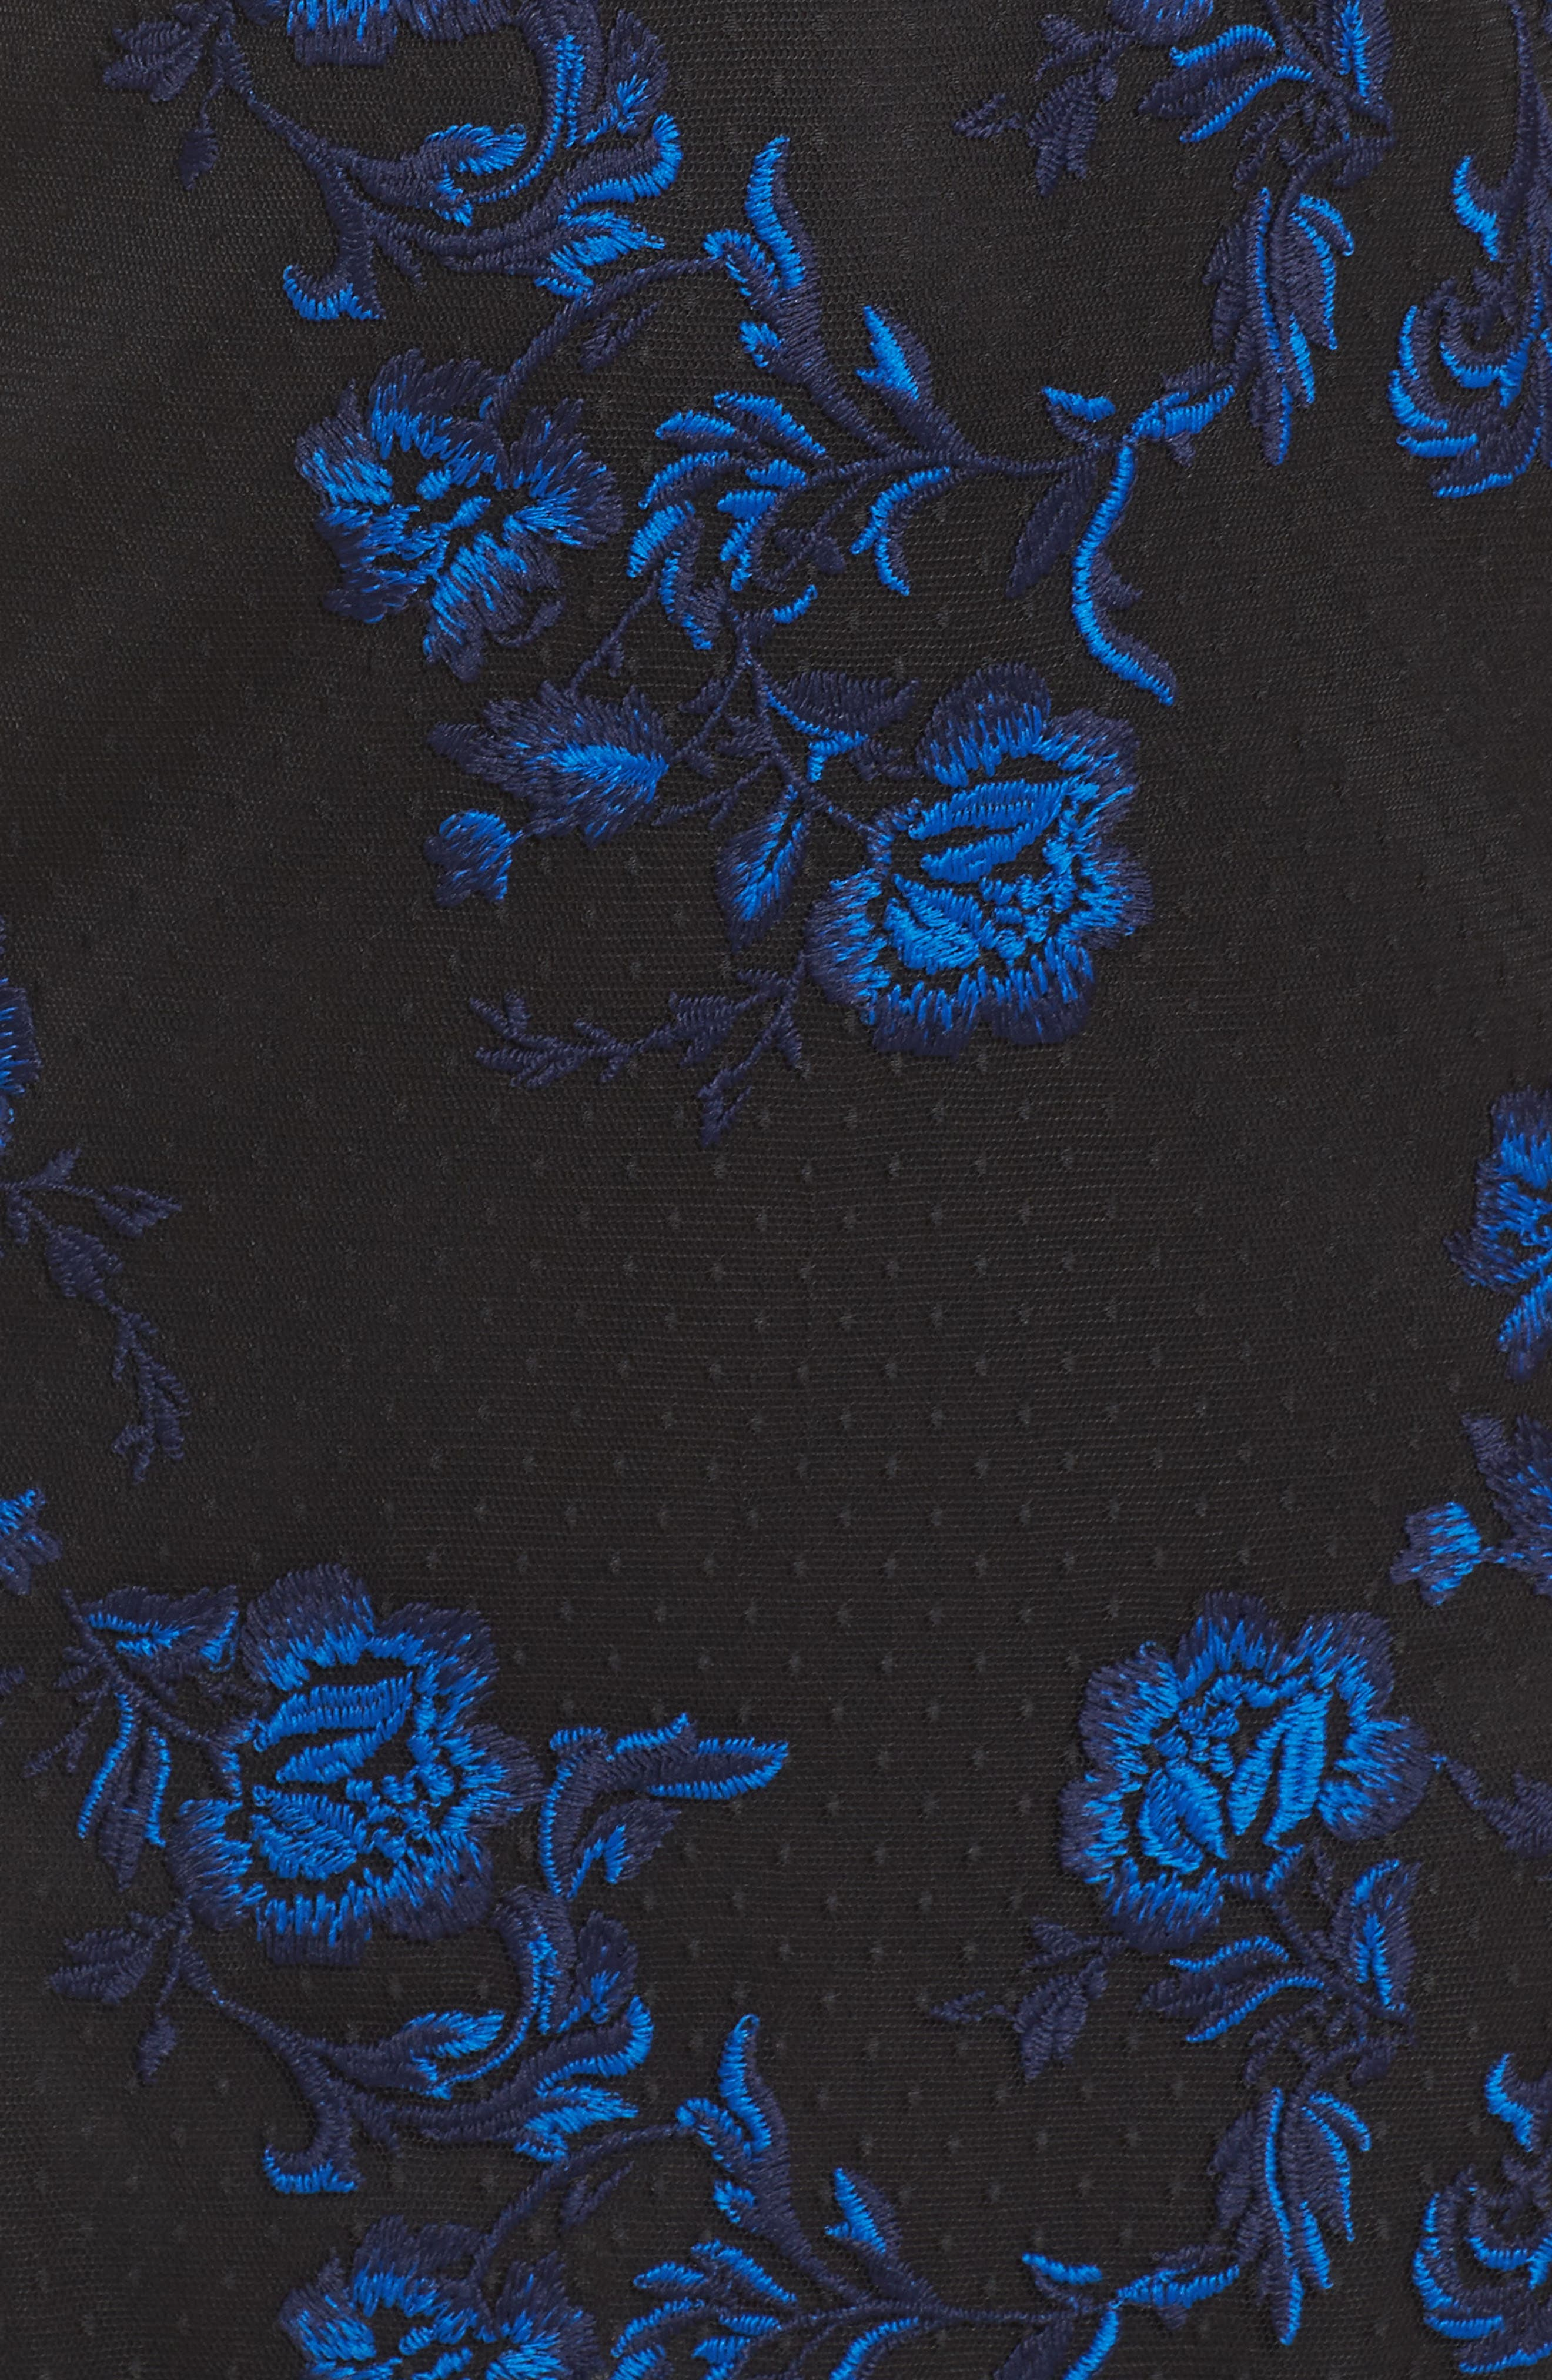 Embroidered Mesh Sheath Dress,                             Alternate thumbnail 5, color,                             010